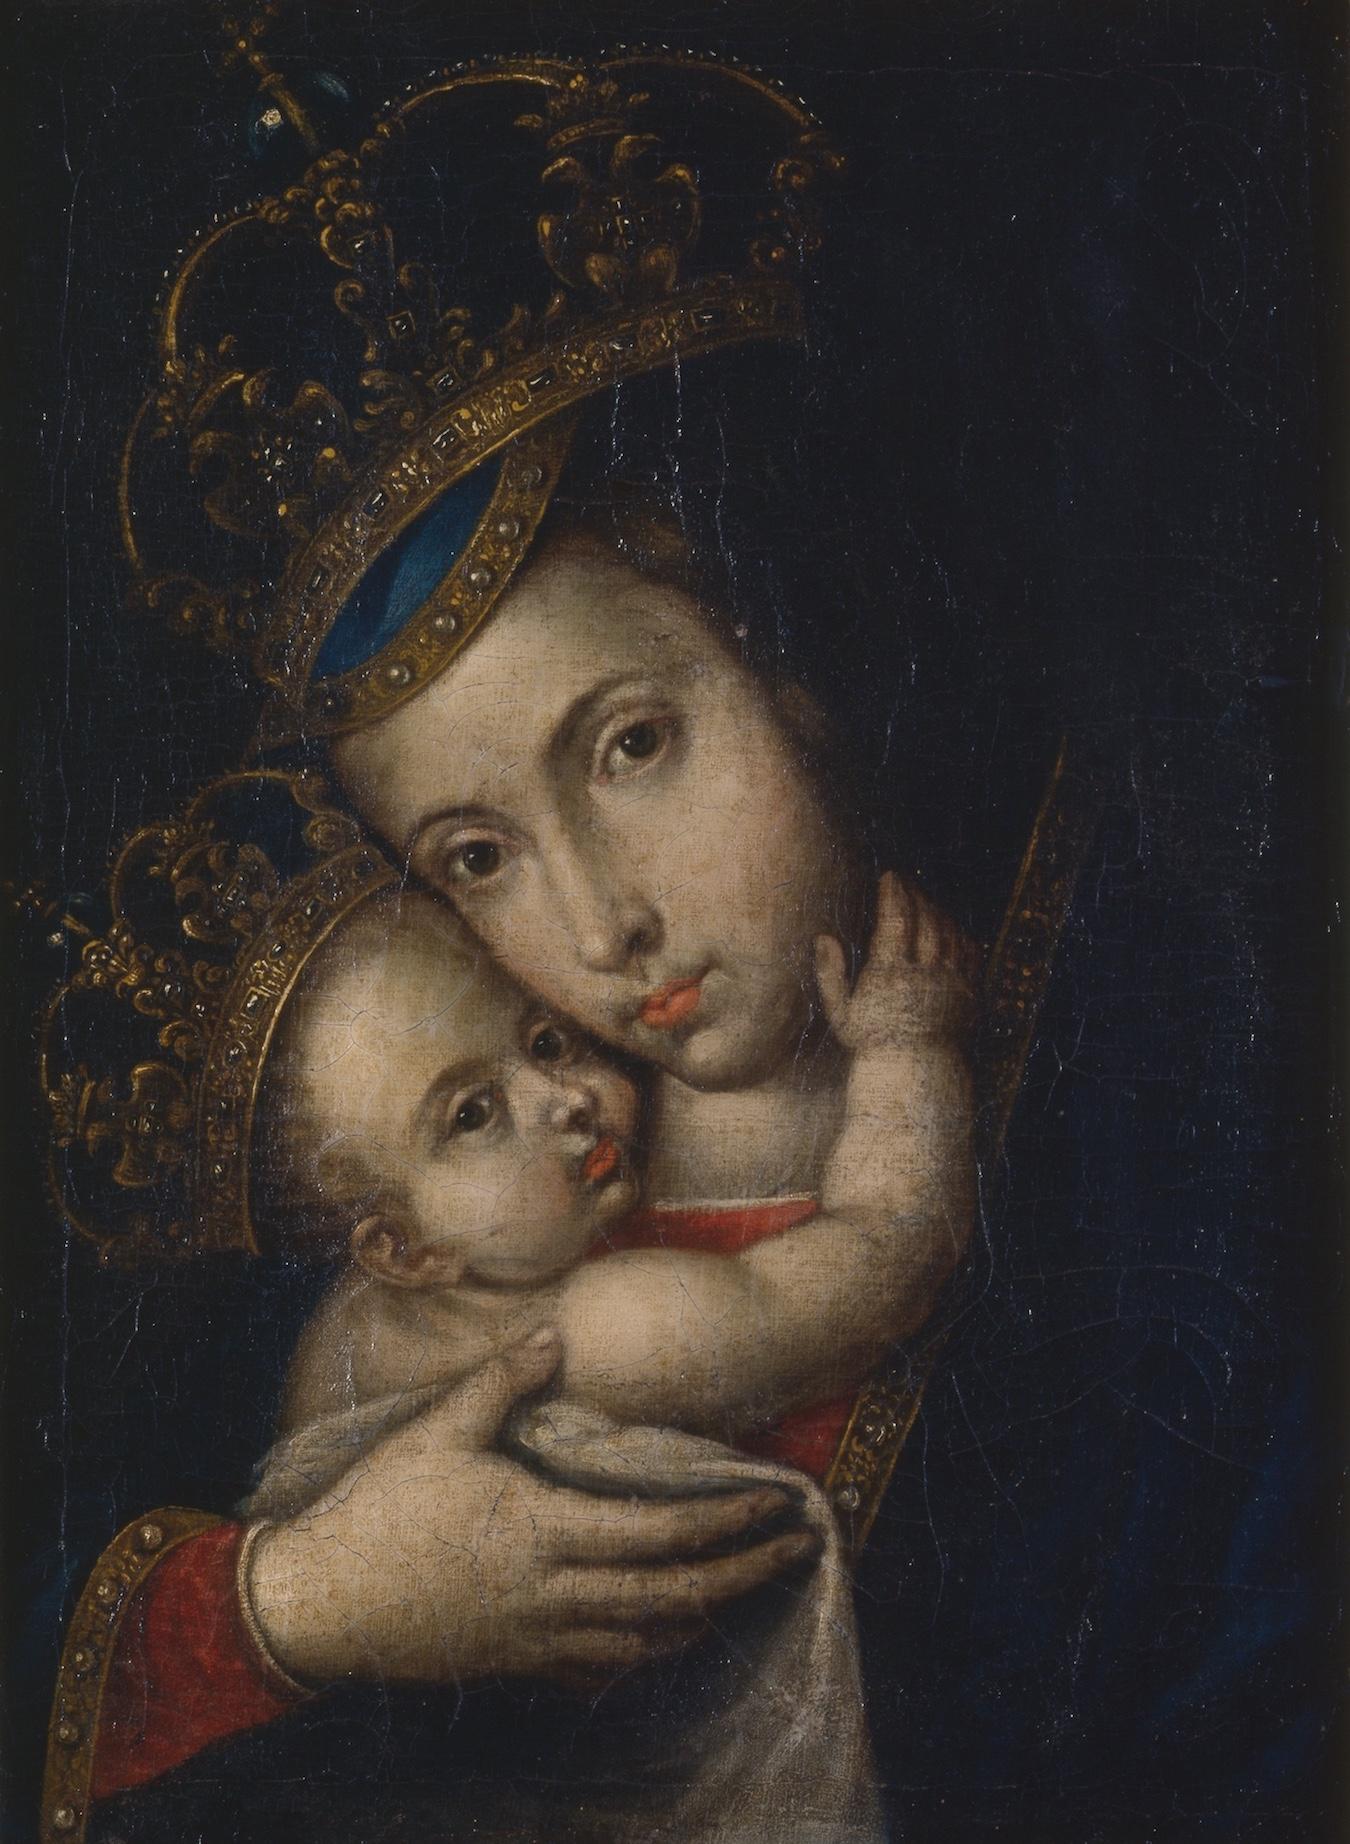 Objeto museológico (Virgem e Menino Coroados)